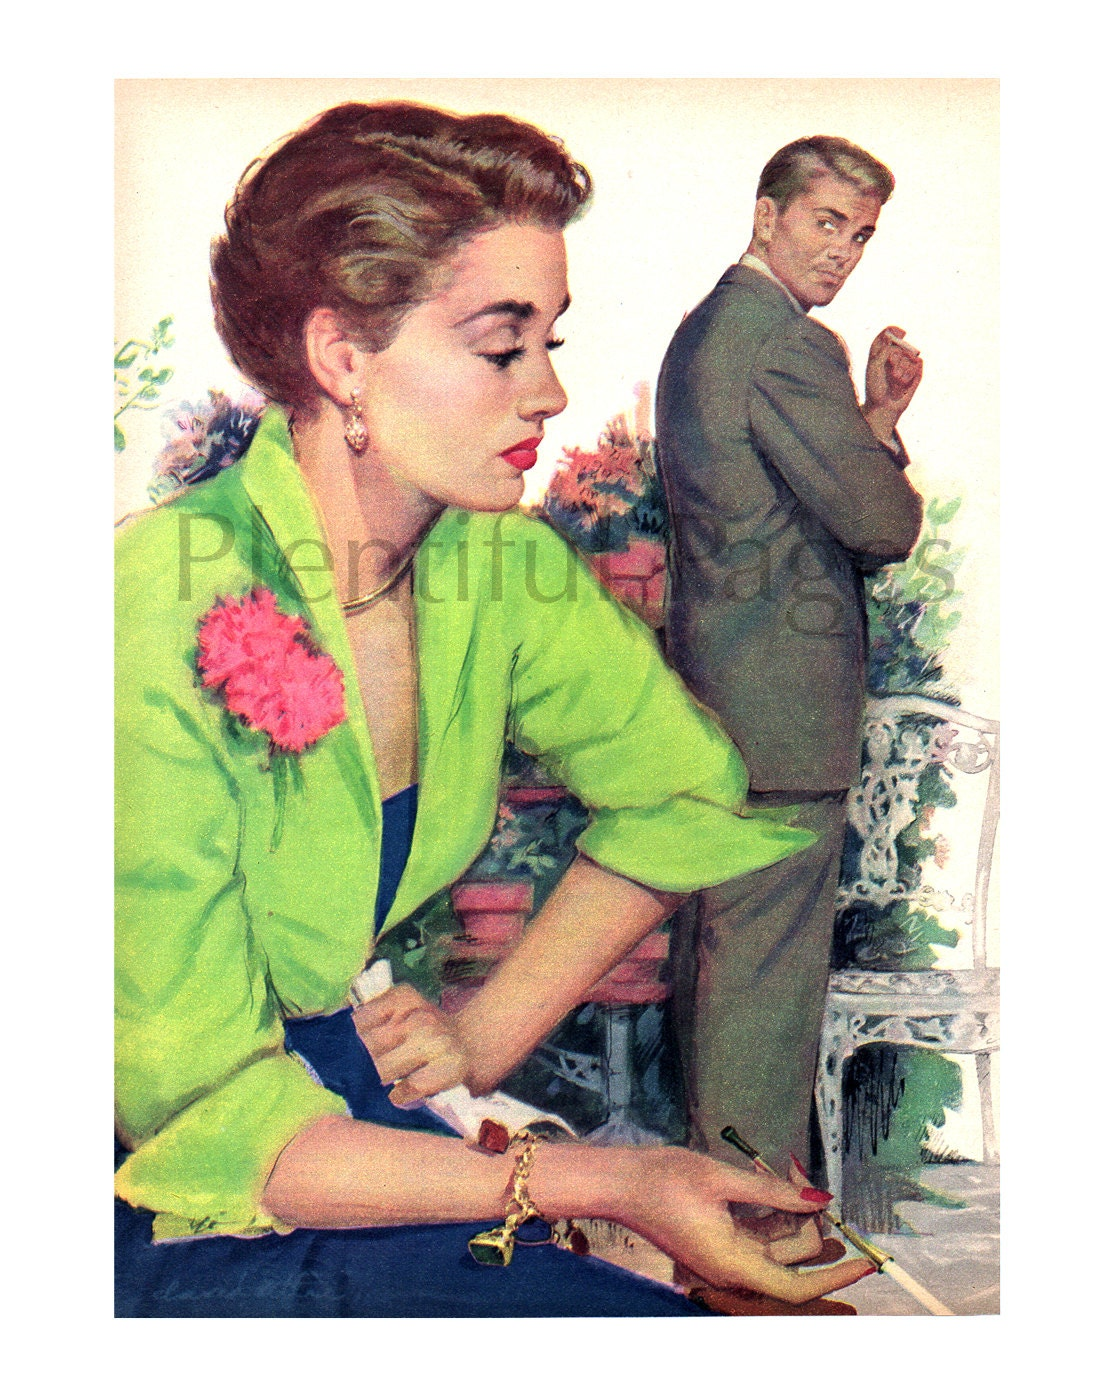 1950 39 S Couple Vintage Magazine Illustration 1950 39 S